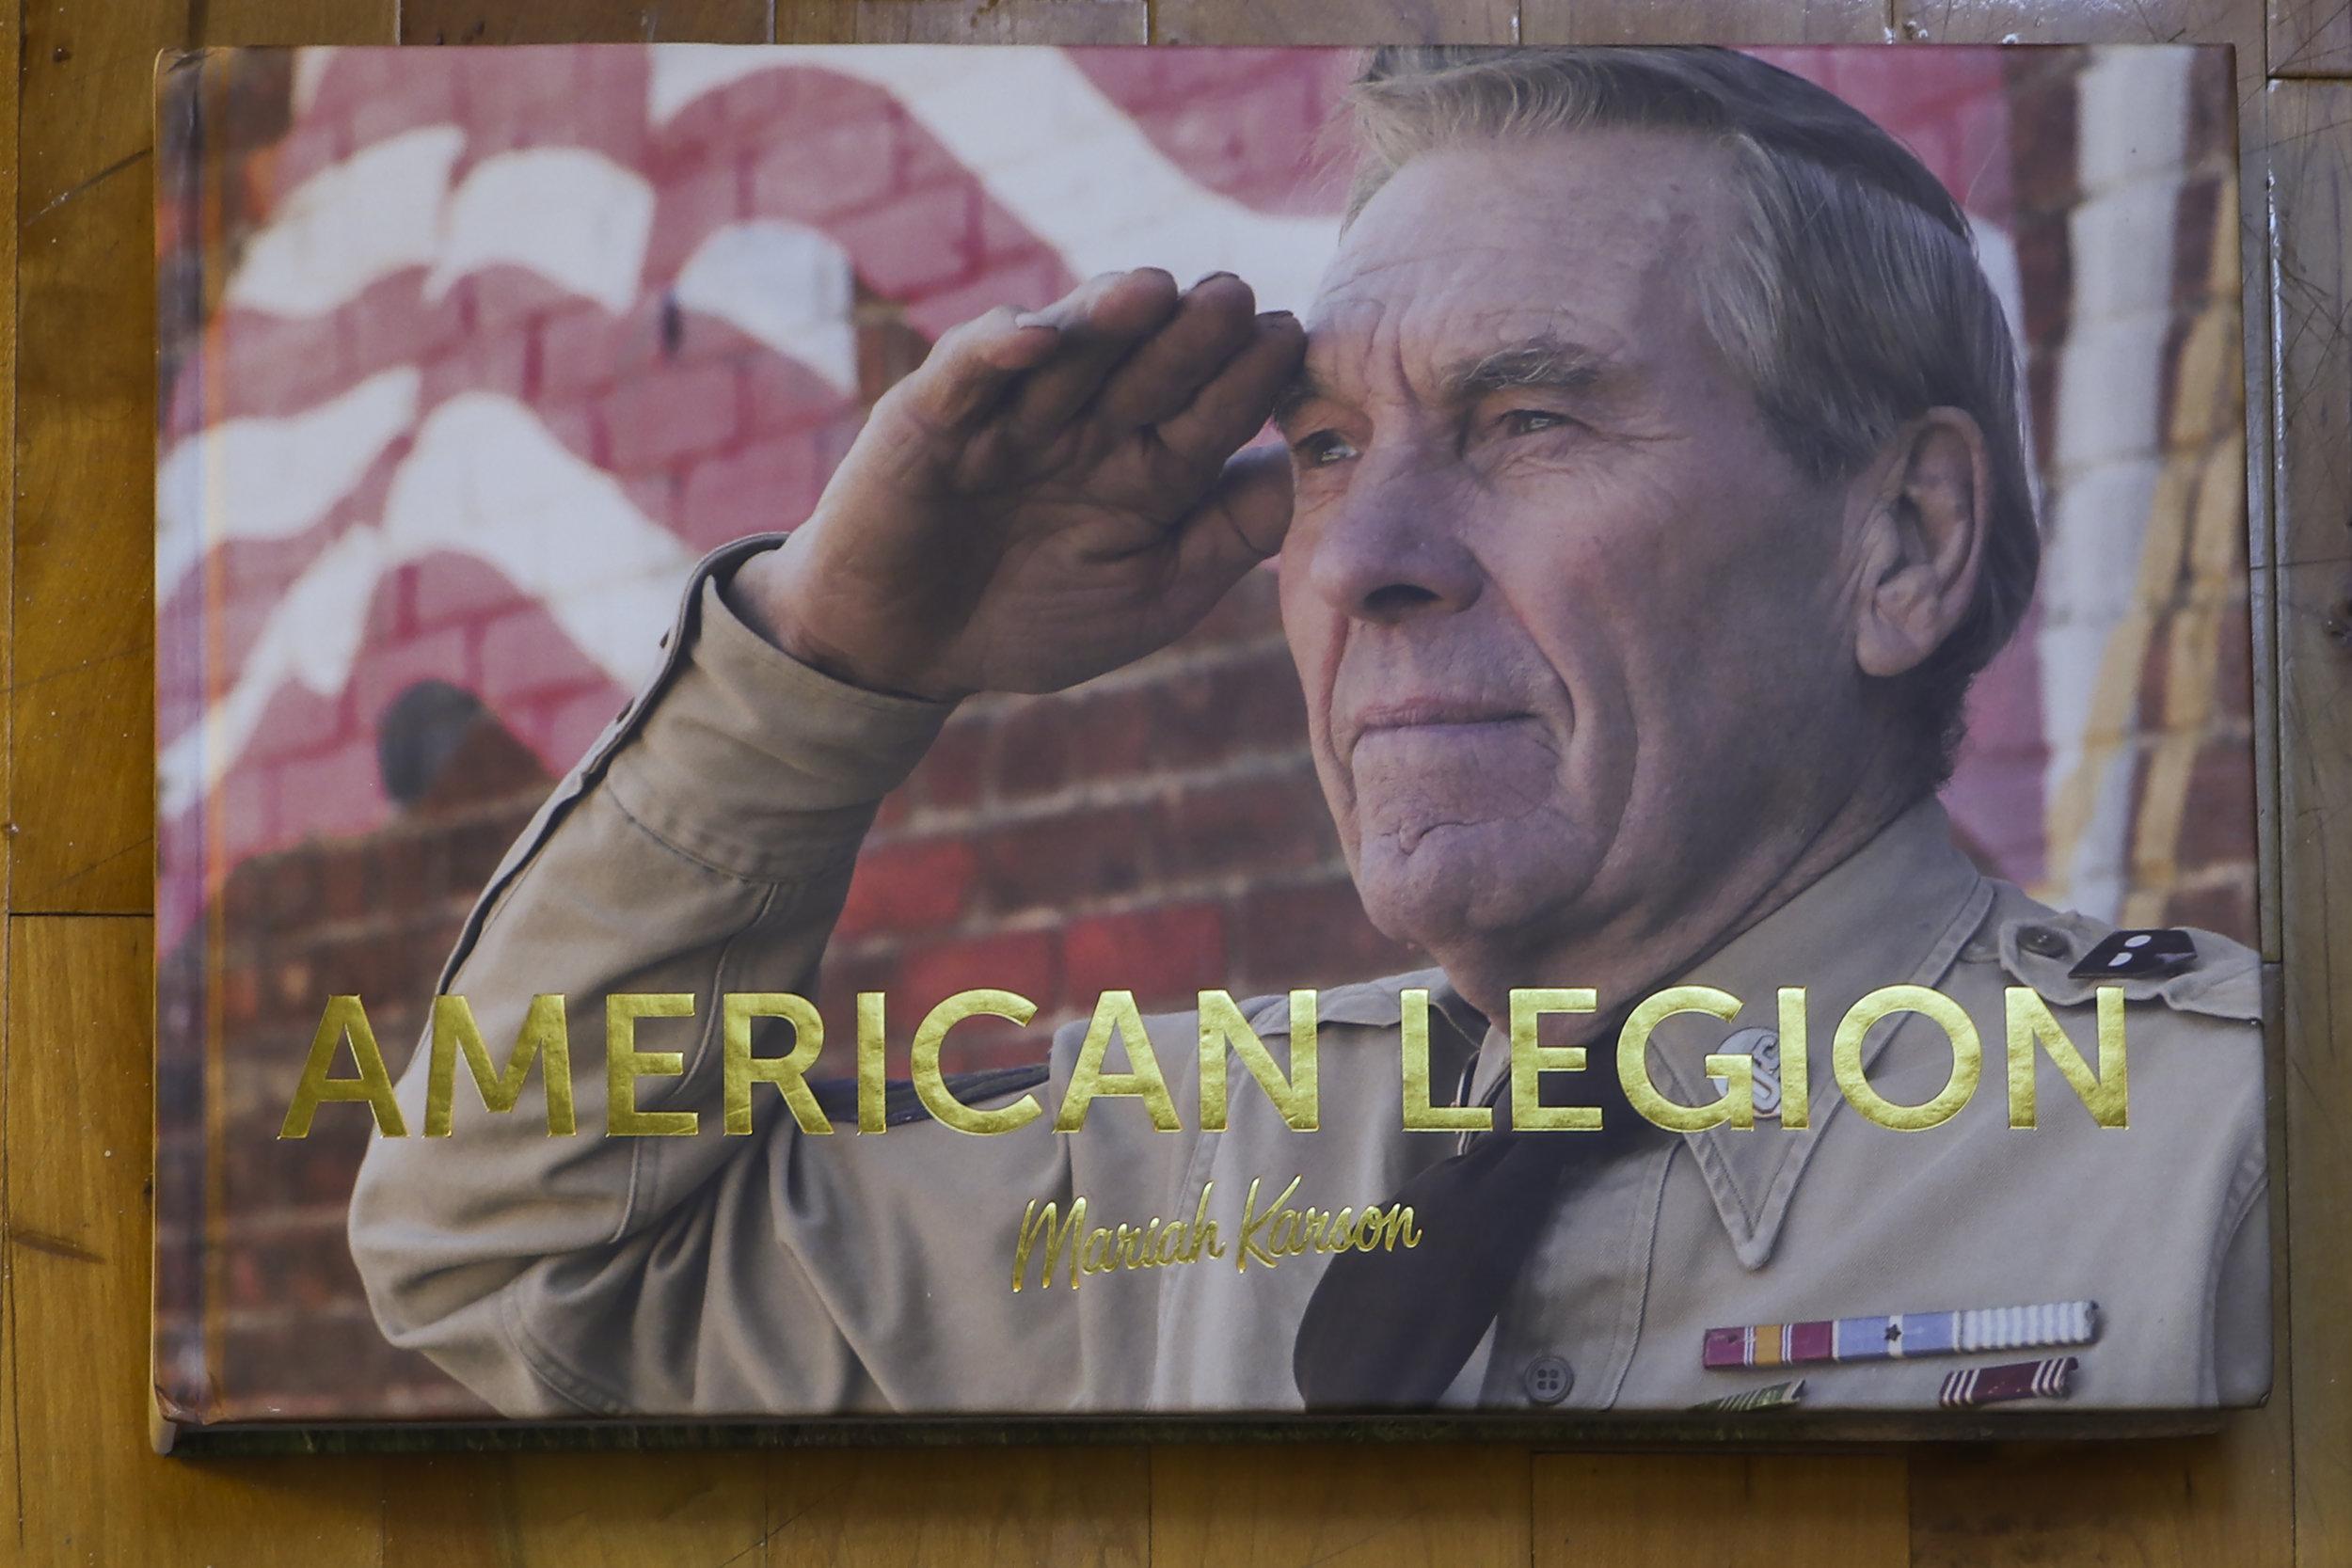 american legion front cover.jpg